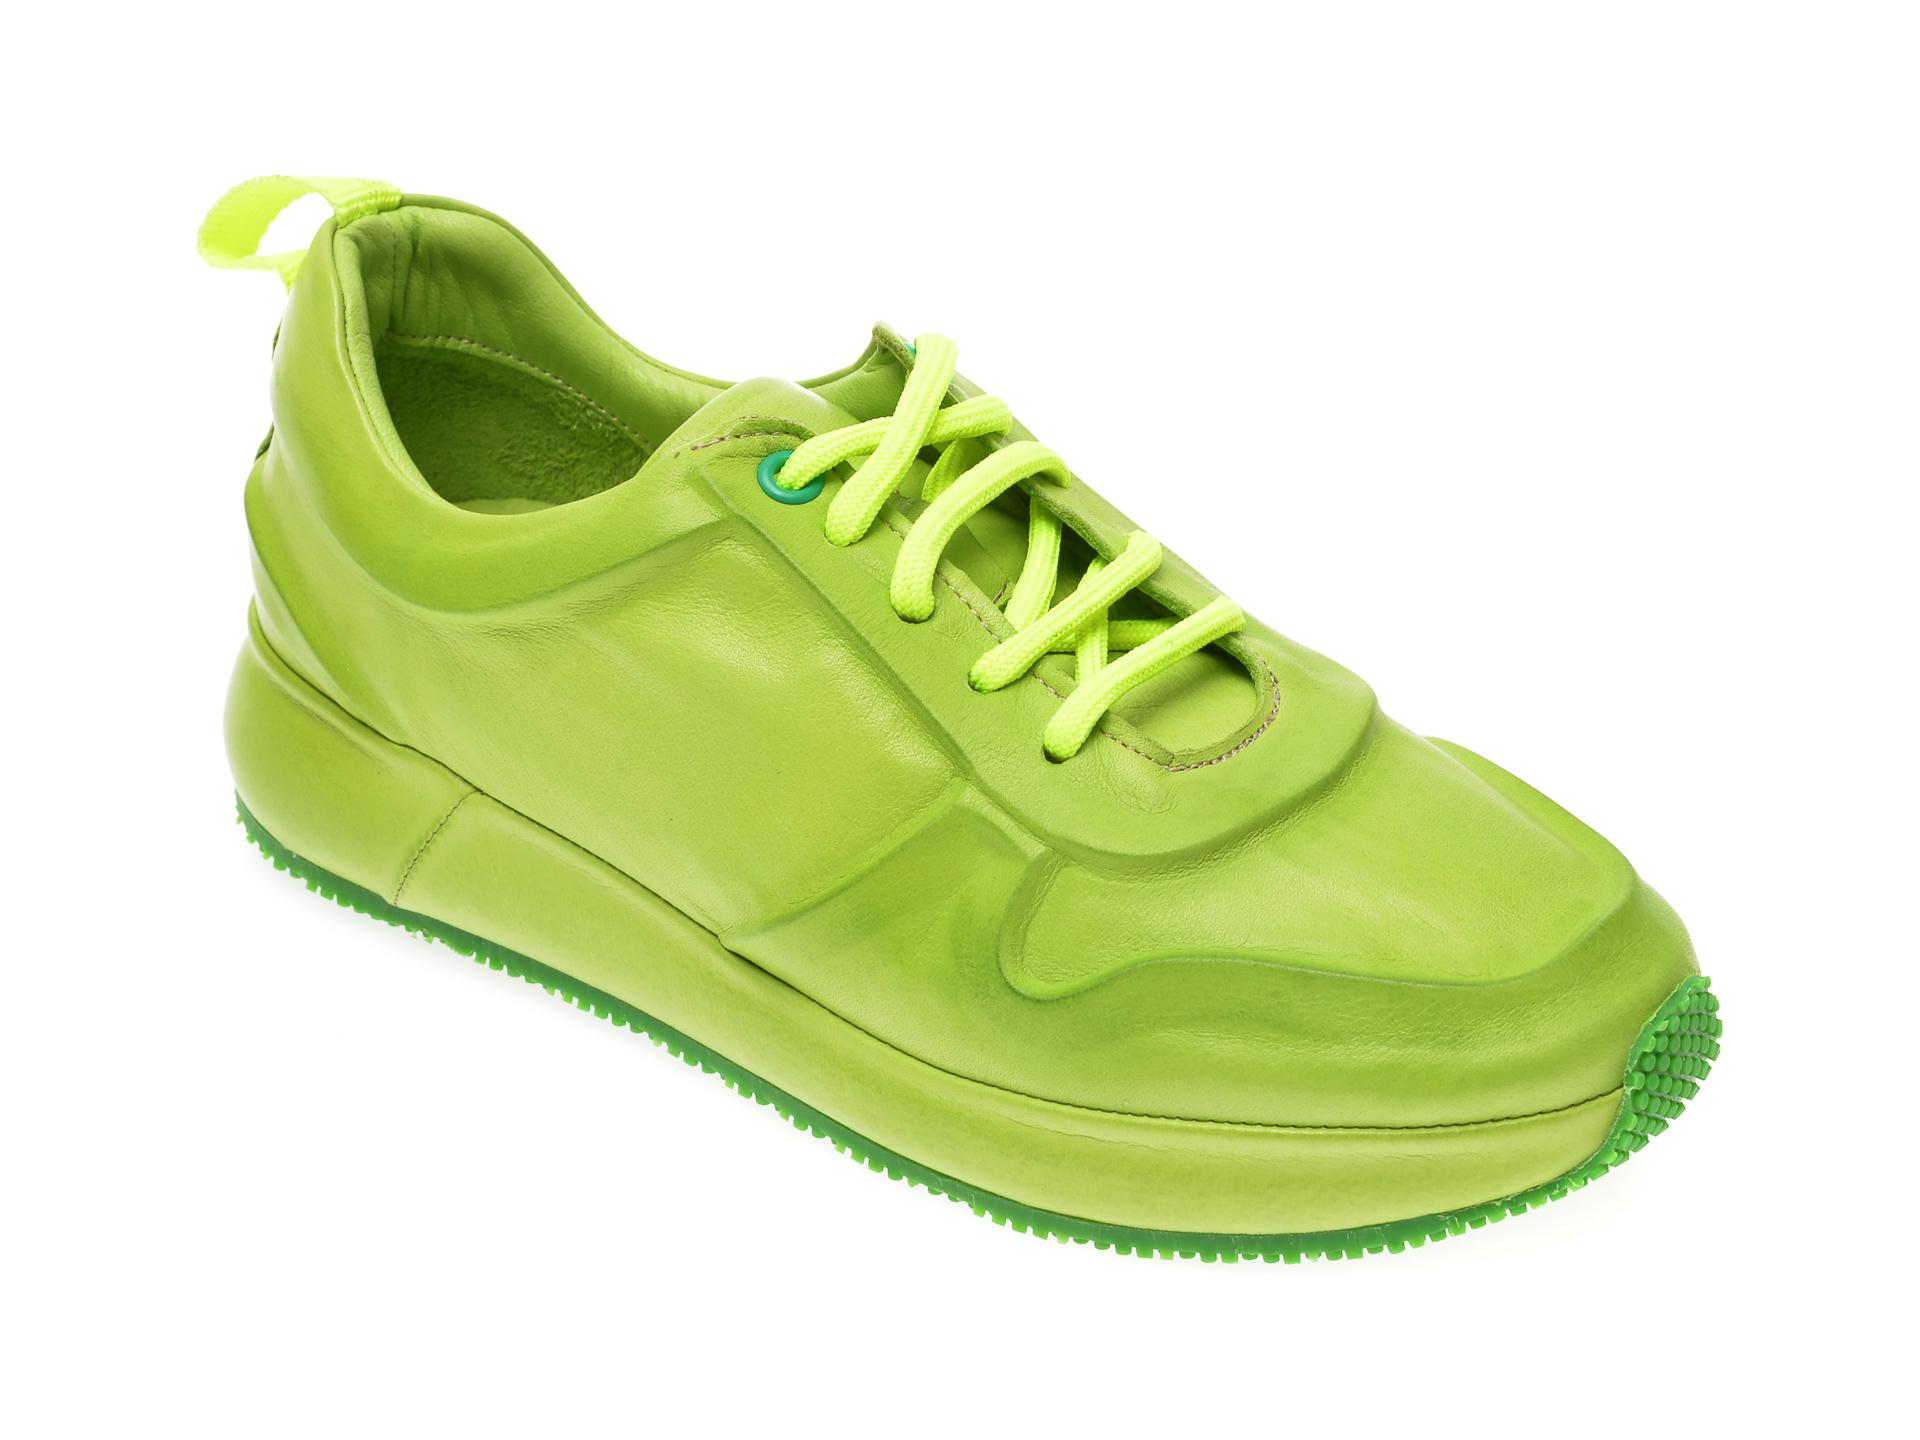 Pantofi sport FLAVIA PASSINI verzi, 1919019, din piele naturala